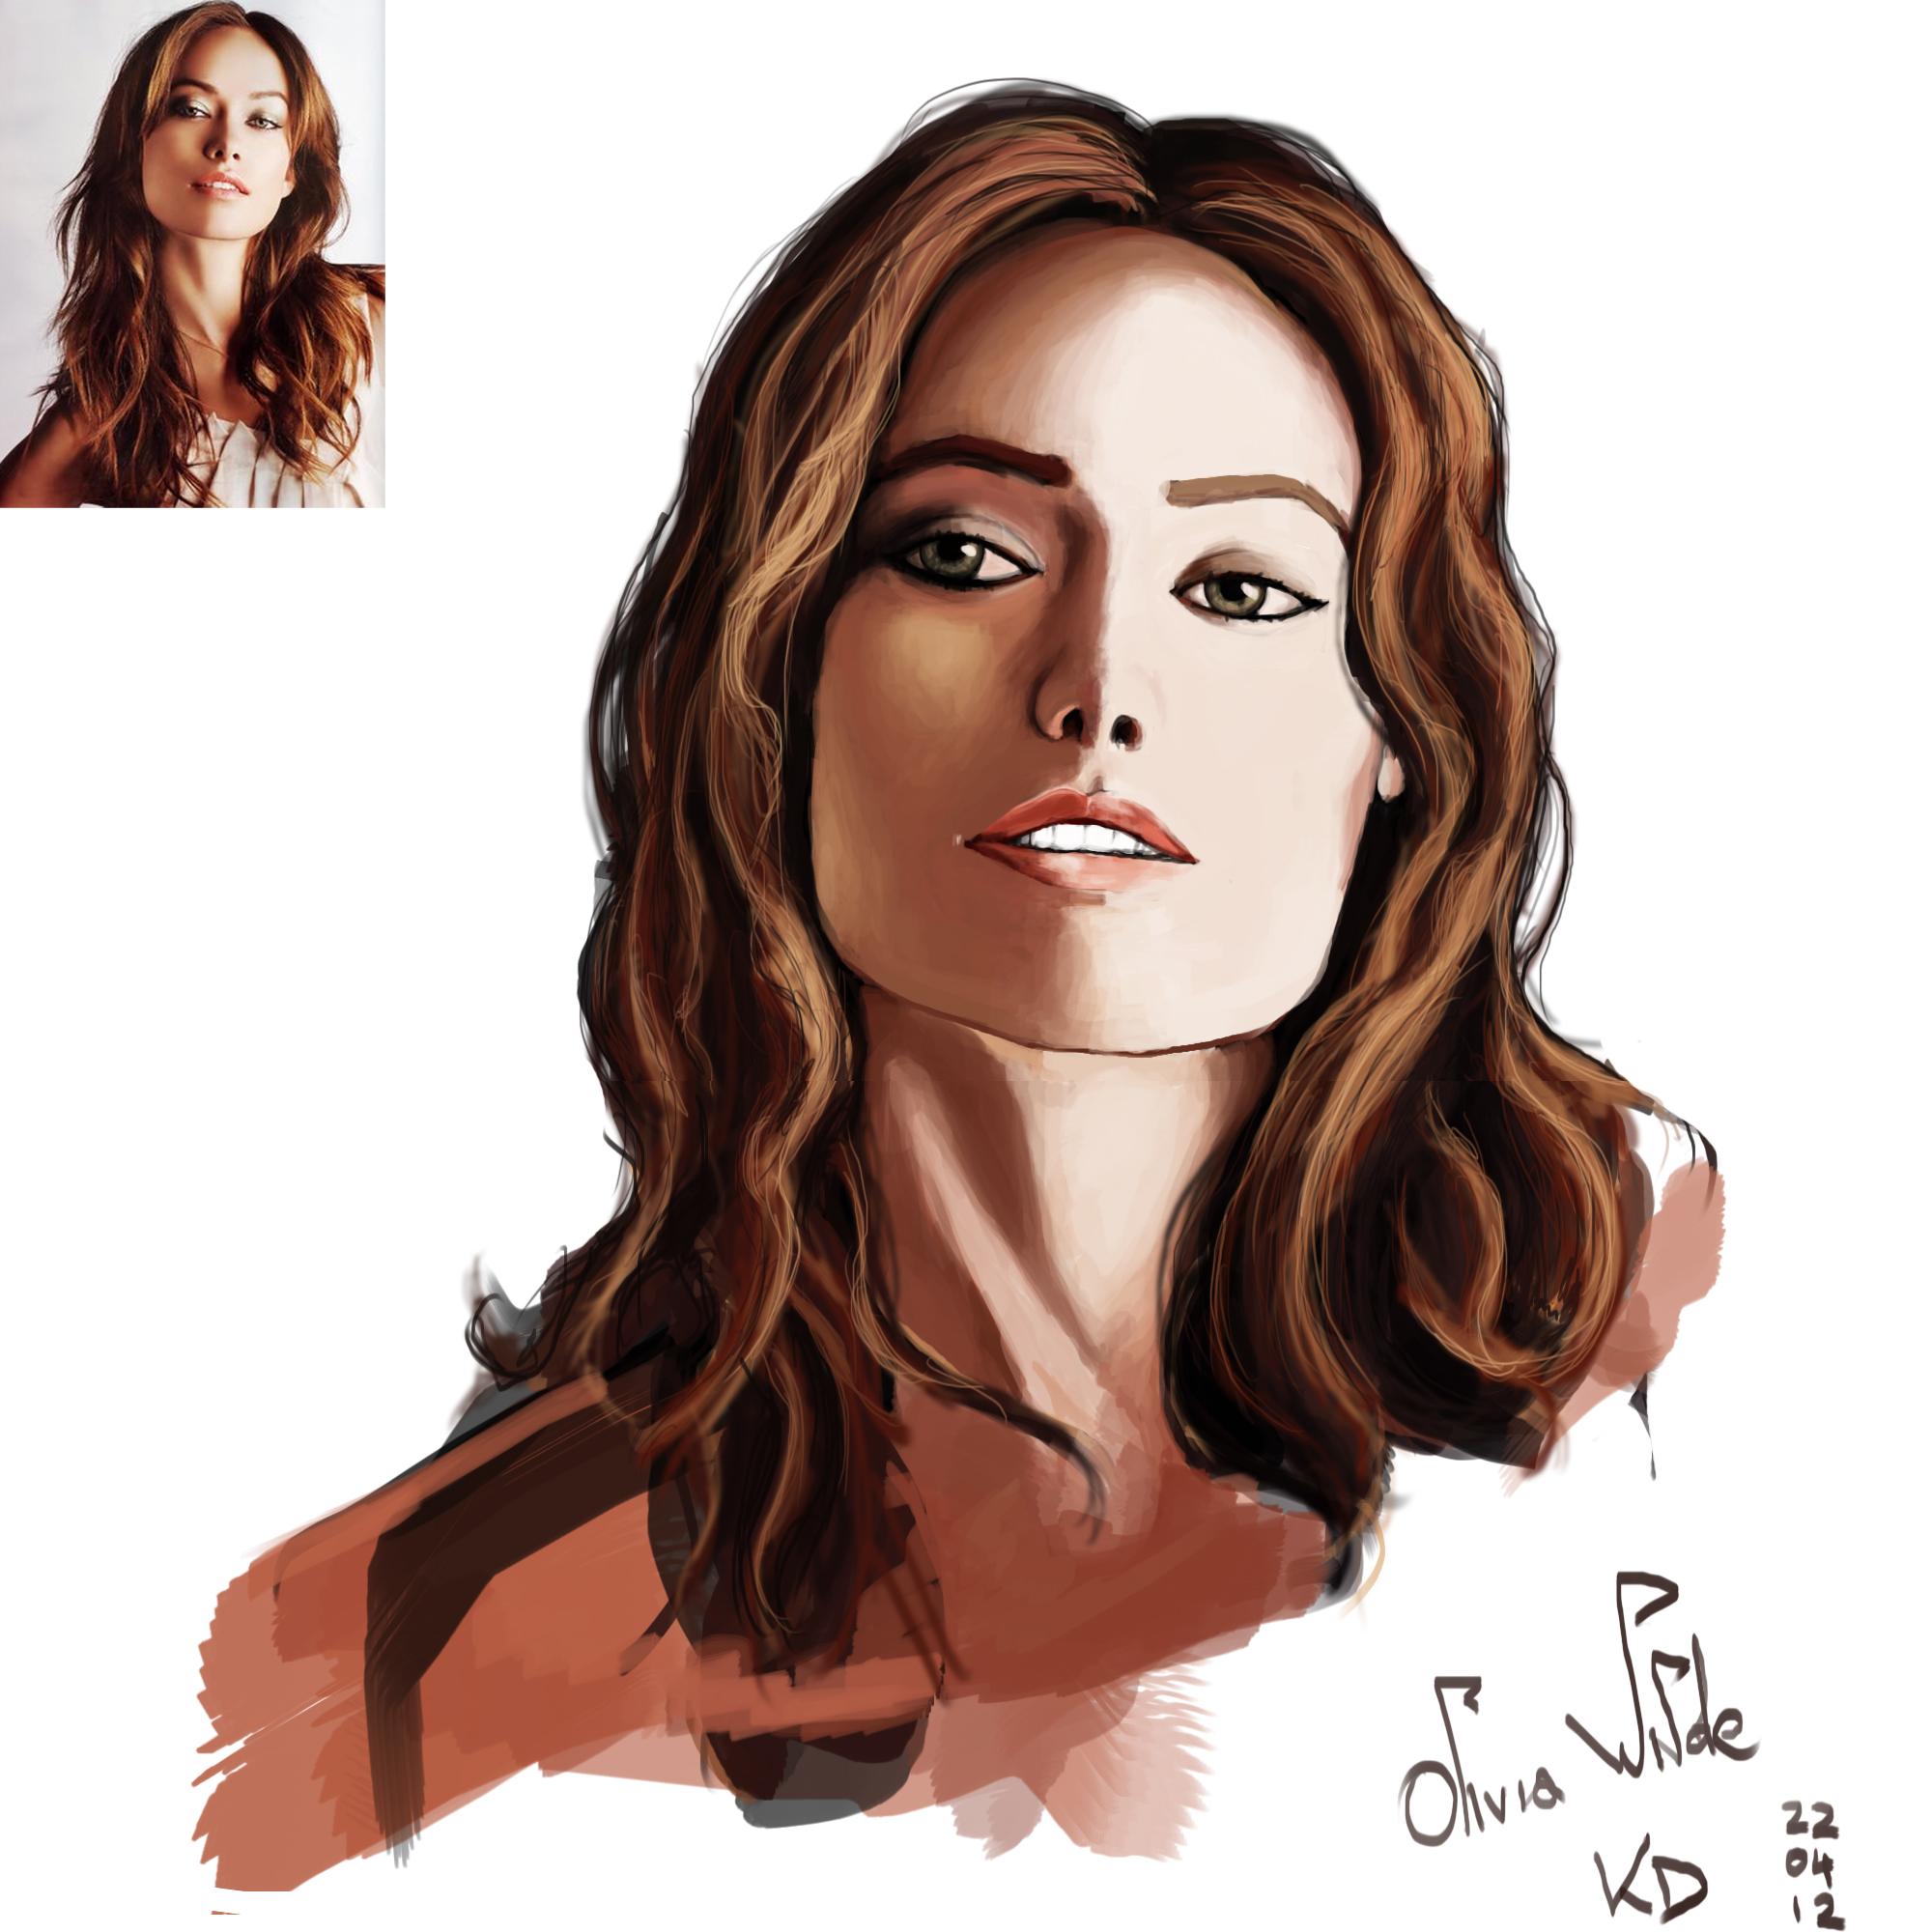 Olivia Wilde portrait